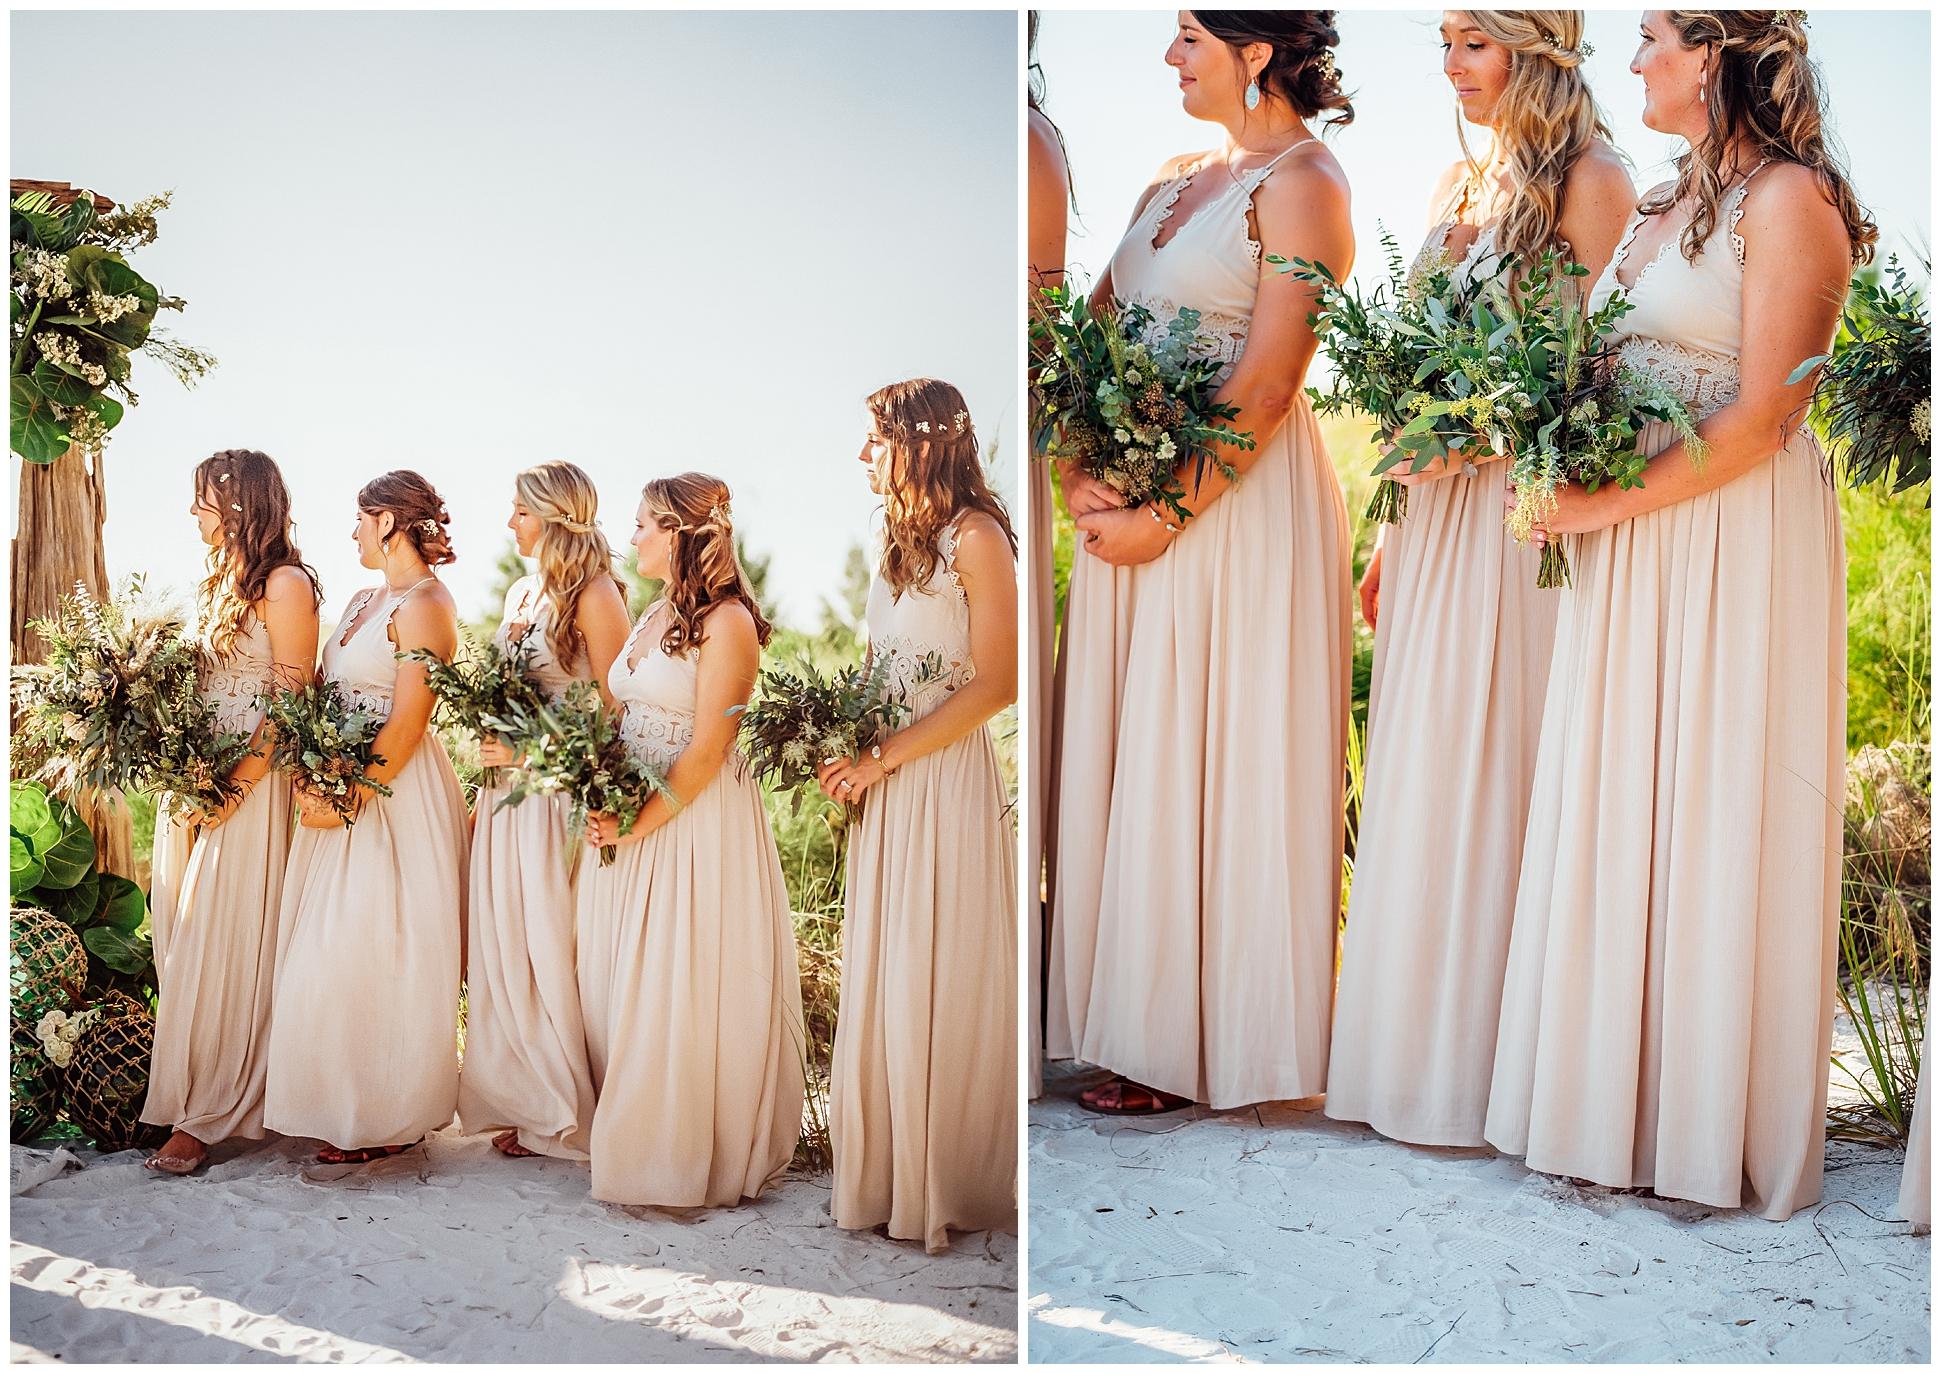 medium-format-film-vs-digital-wedding-photography-florida-beach_0013.jpg